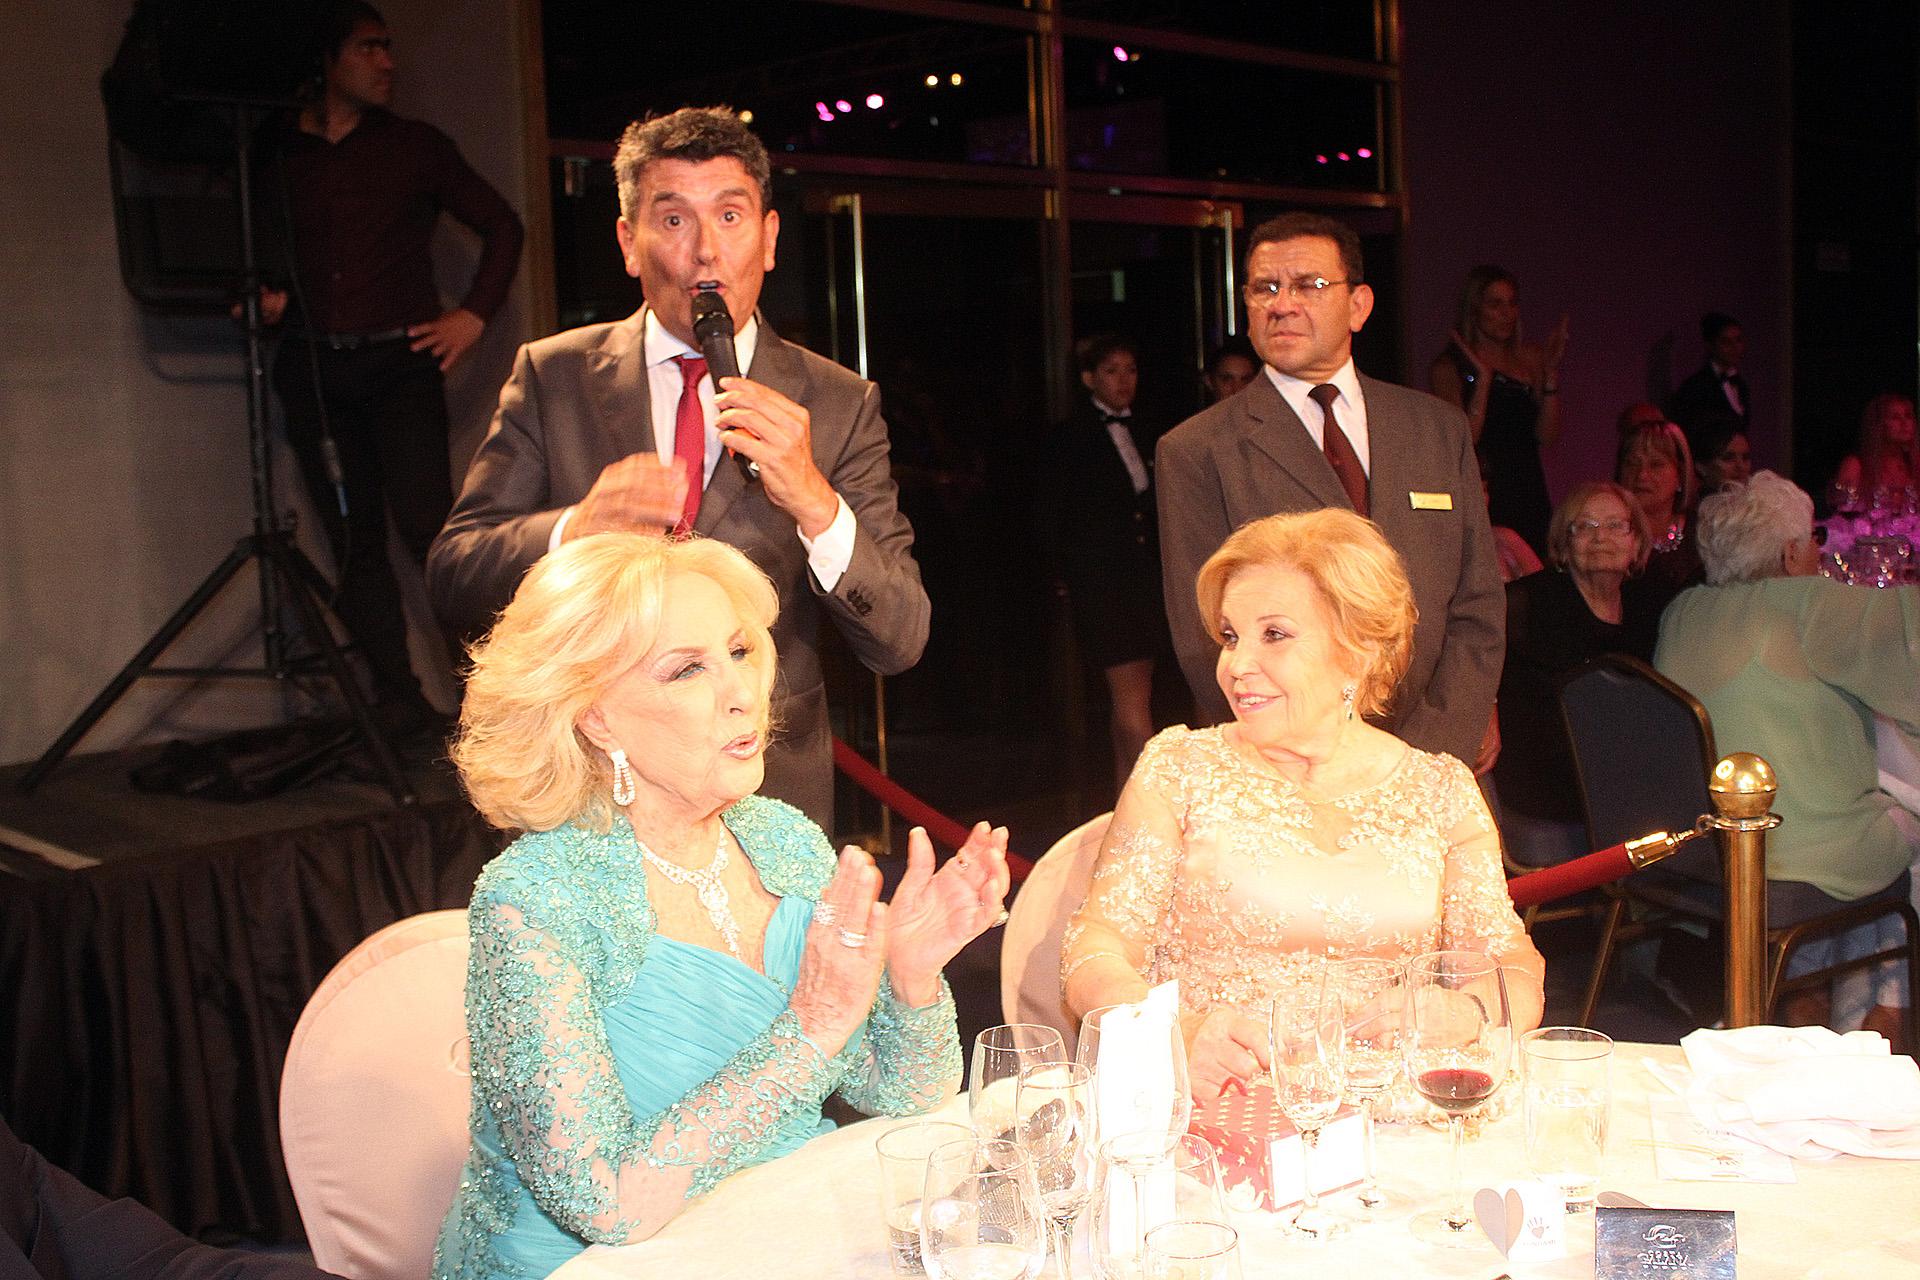 Miguel Ángel Cherutti hizo un show humorístico